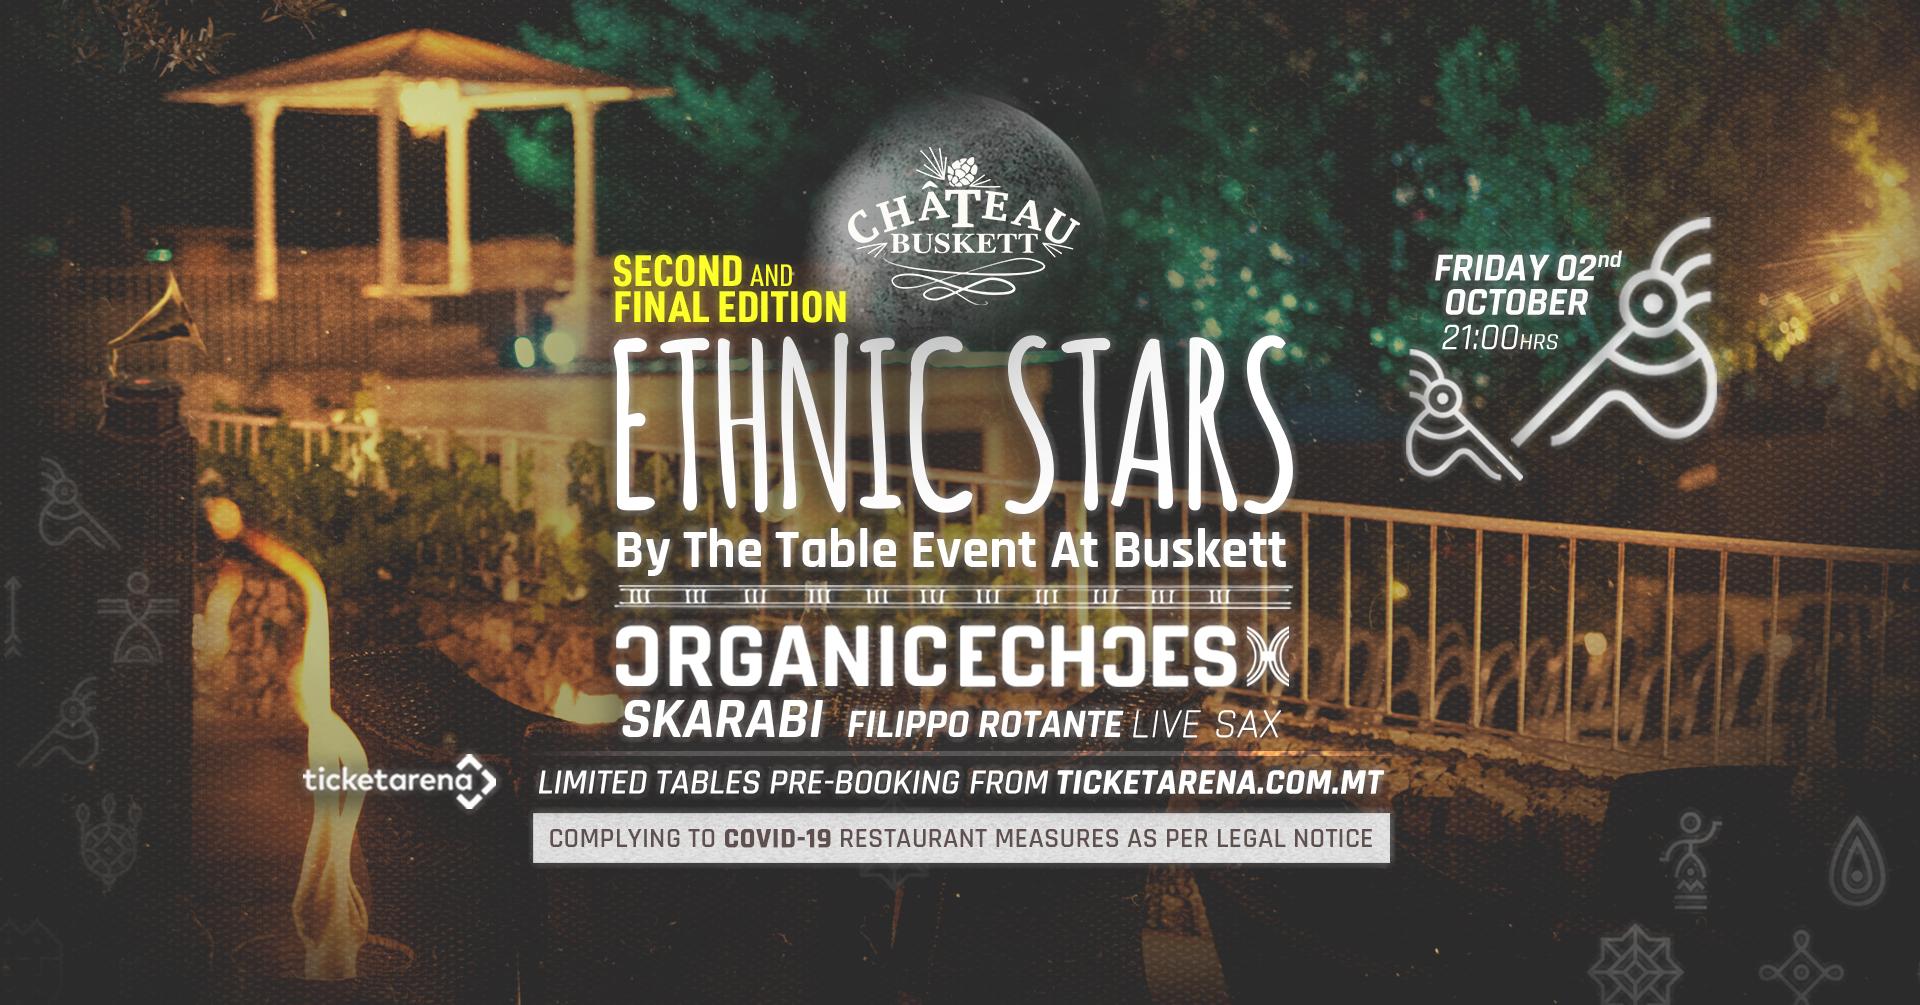 ETHNIC STARS - Second & Final Edition - 02.10